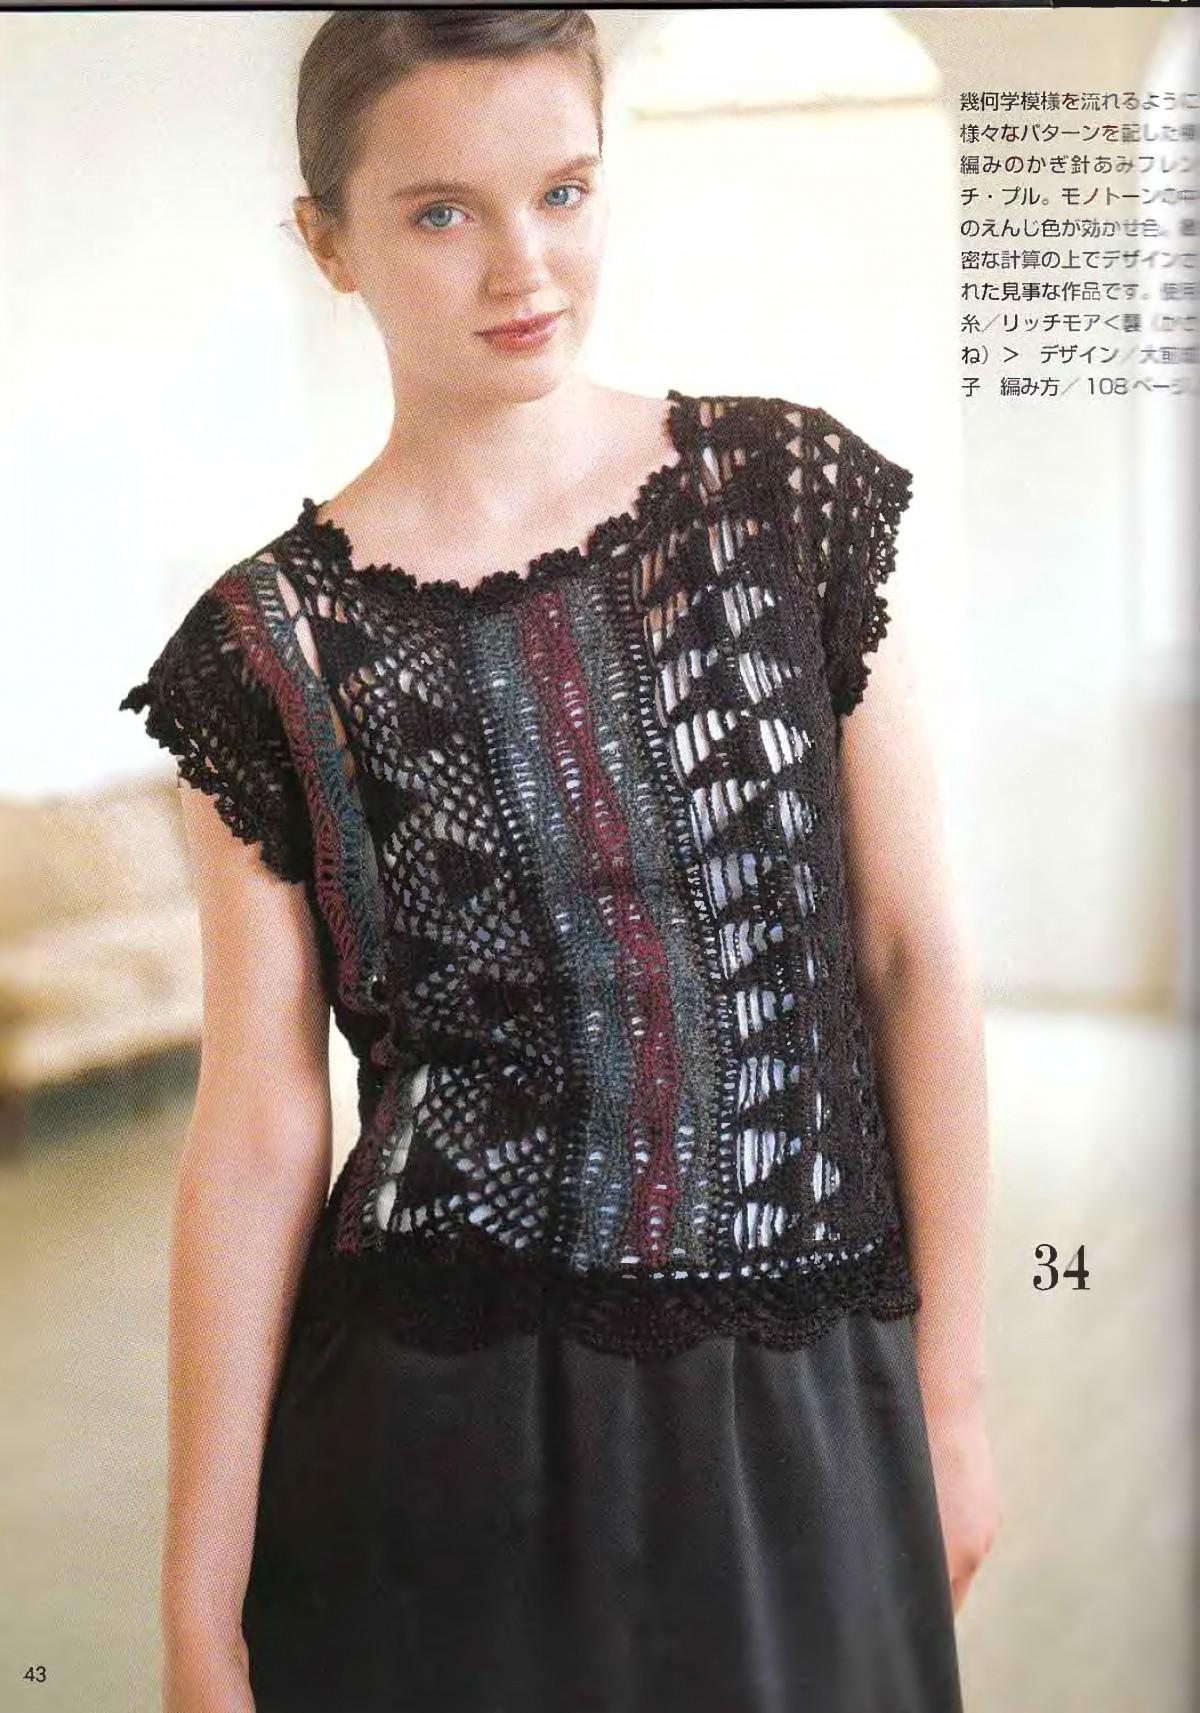 Lets-knit-series-NV4359-2008-Spring-Summer-sp-kr_41.jpg